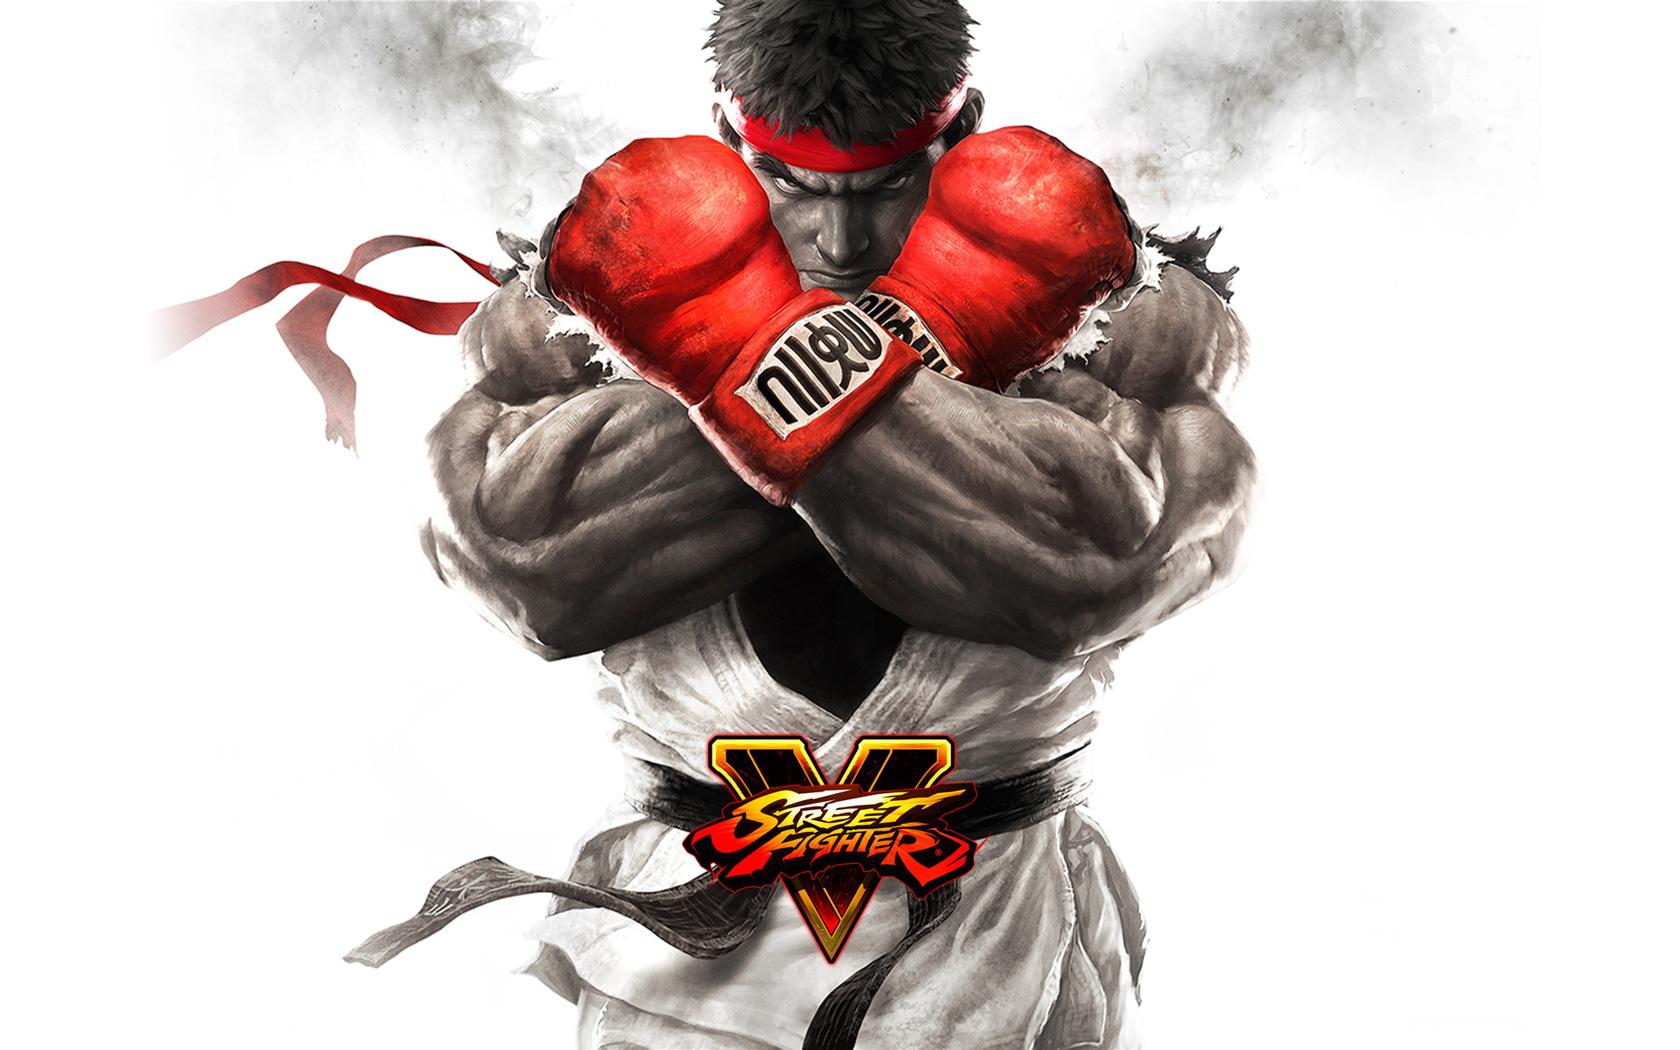 Free Street Fighter V Wallpaper in 1680x1050